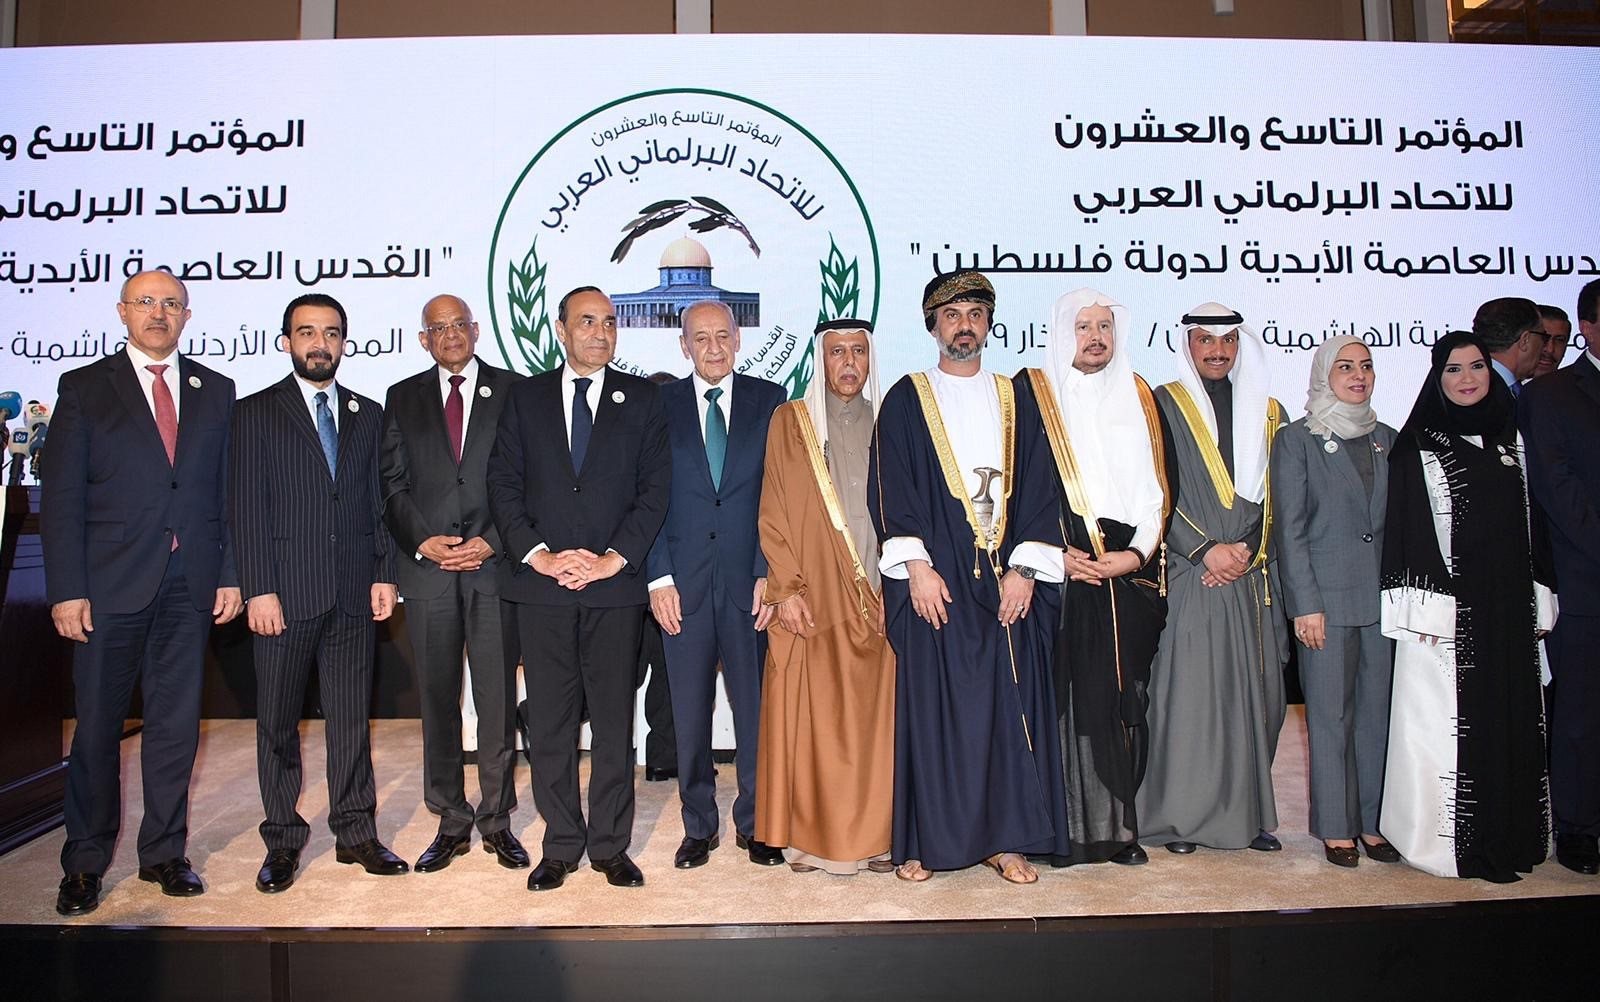 """Arab NATO"" project on very shaky ground"